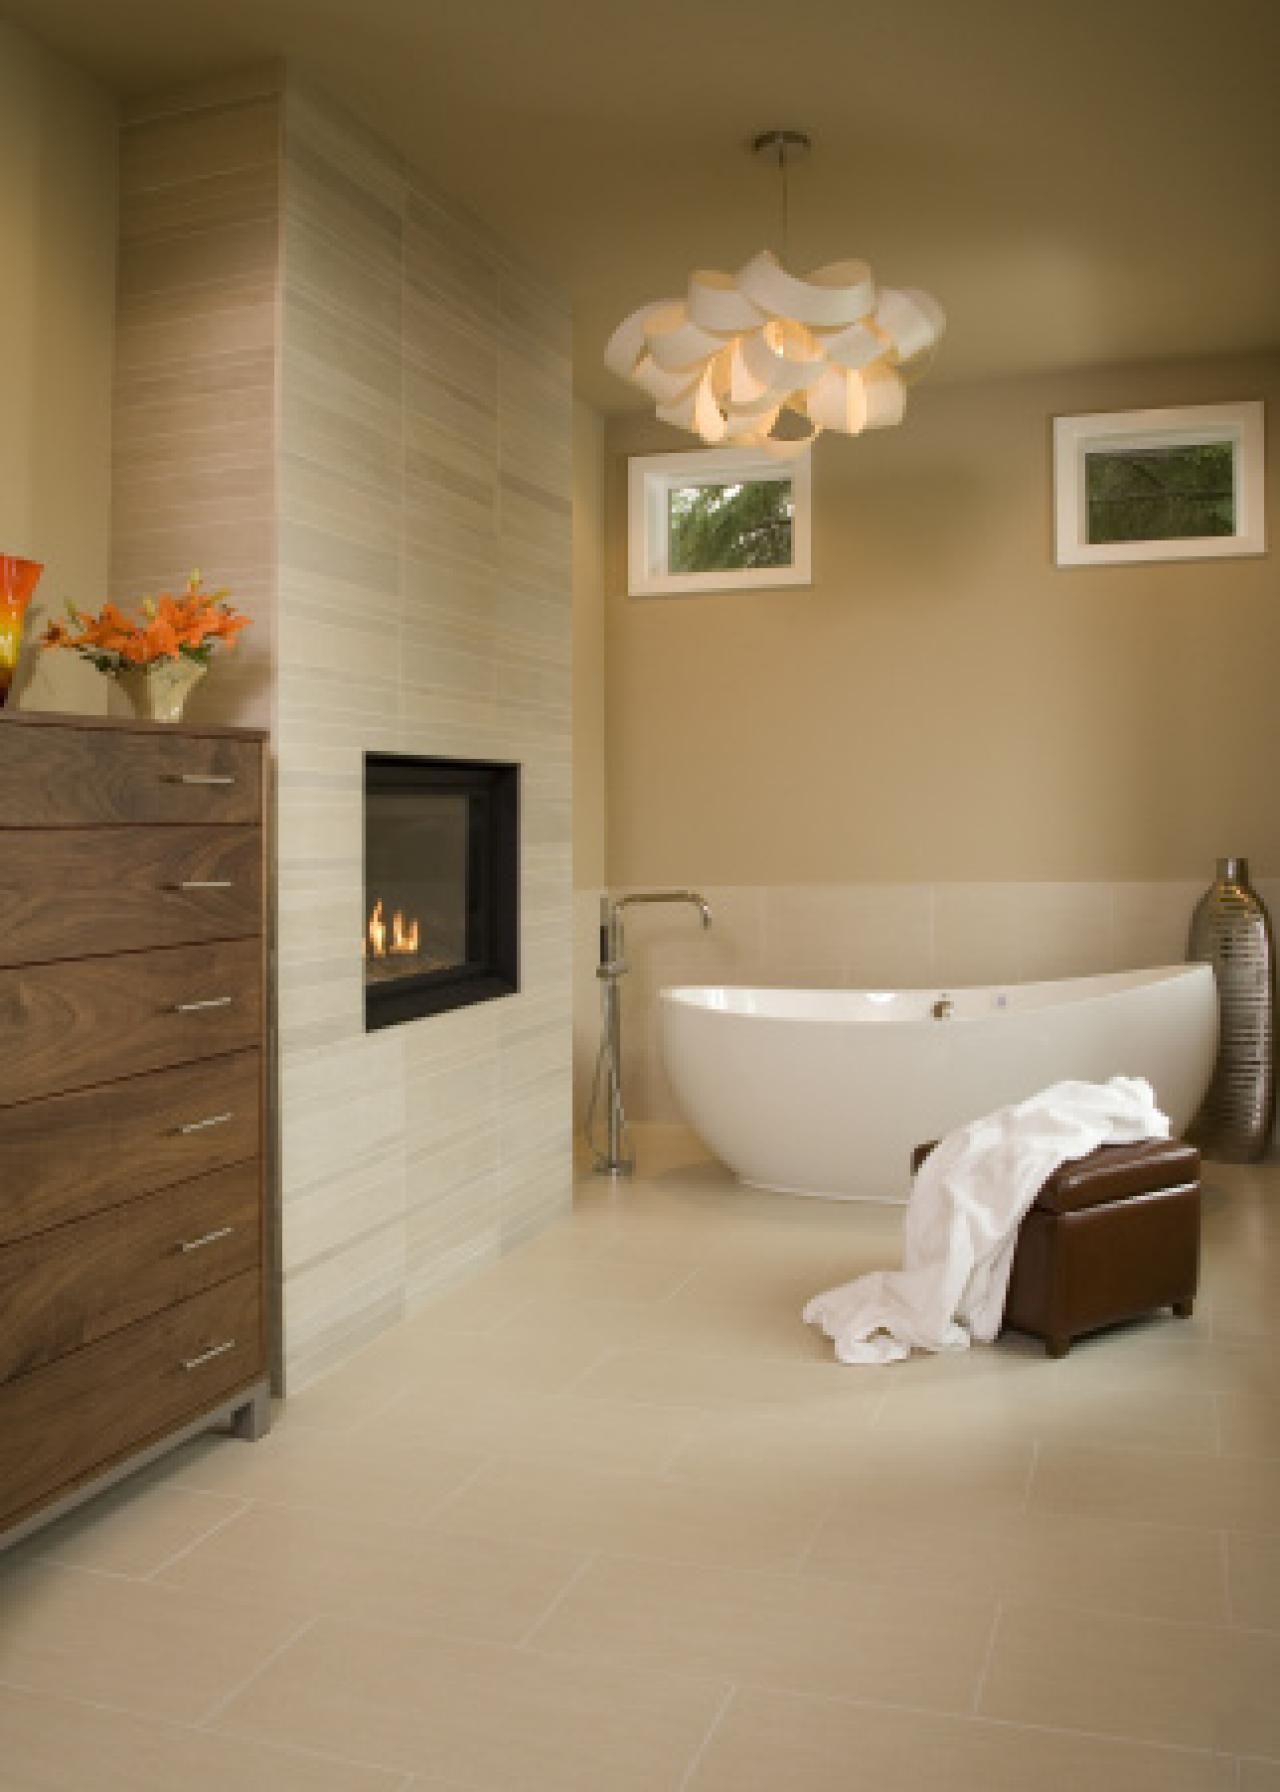 Best bathroom interior  small bathroom designs on a budget  best interior paint brand